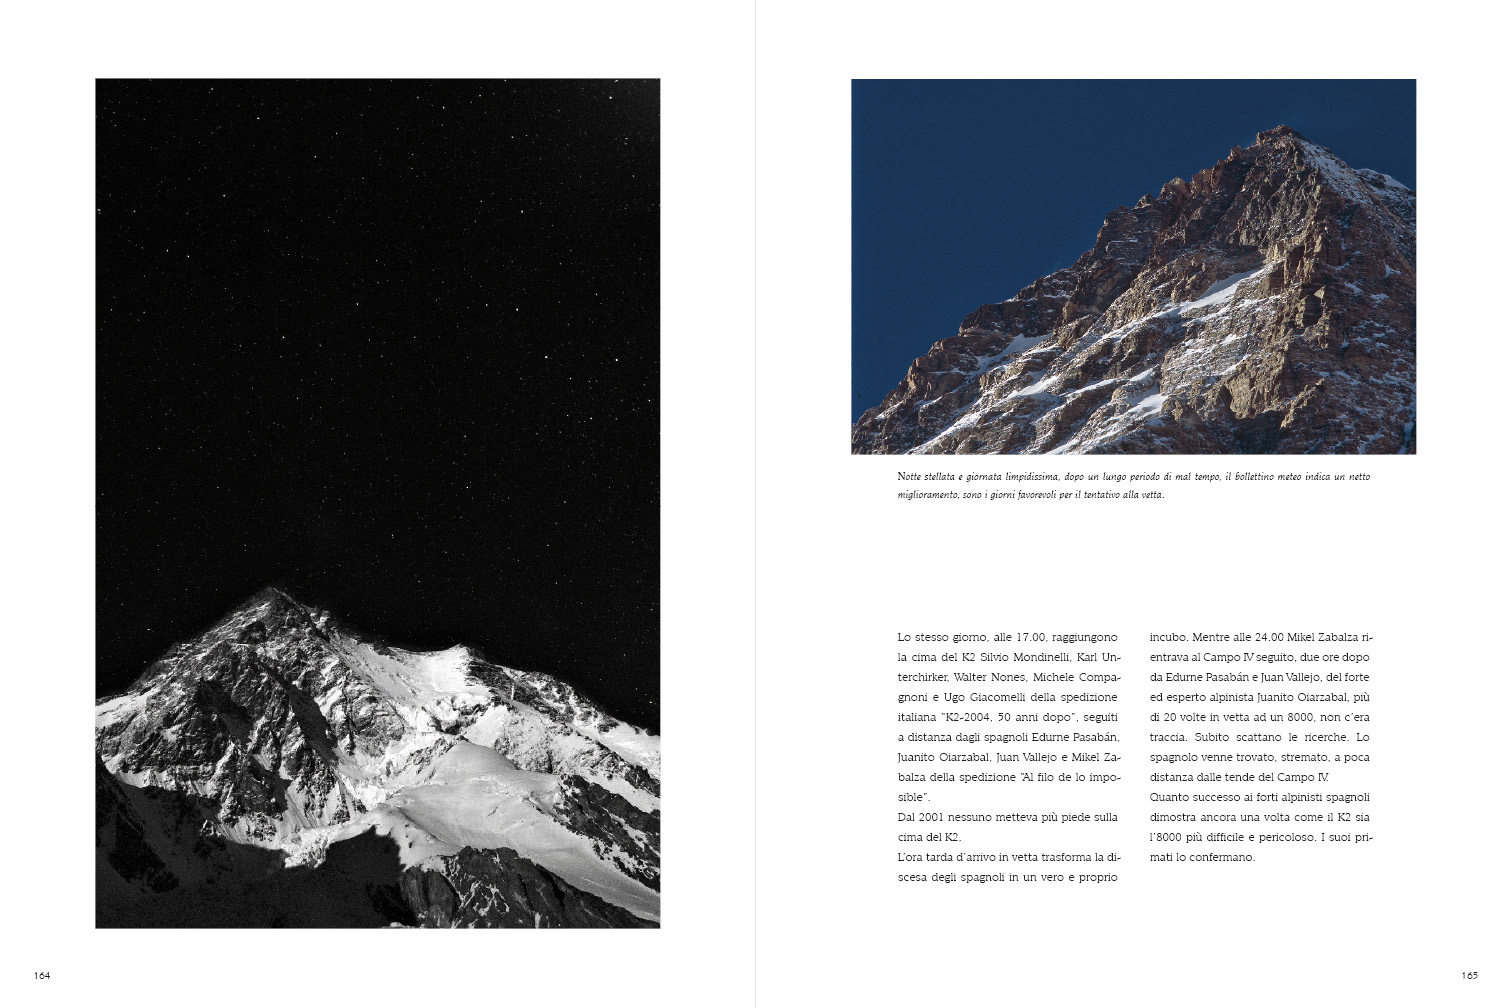 K2 EXPEDITION 1954-2004 Giuseppe Ghedina Fotografo - 084.jpg